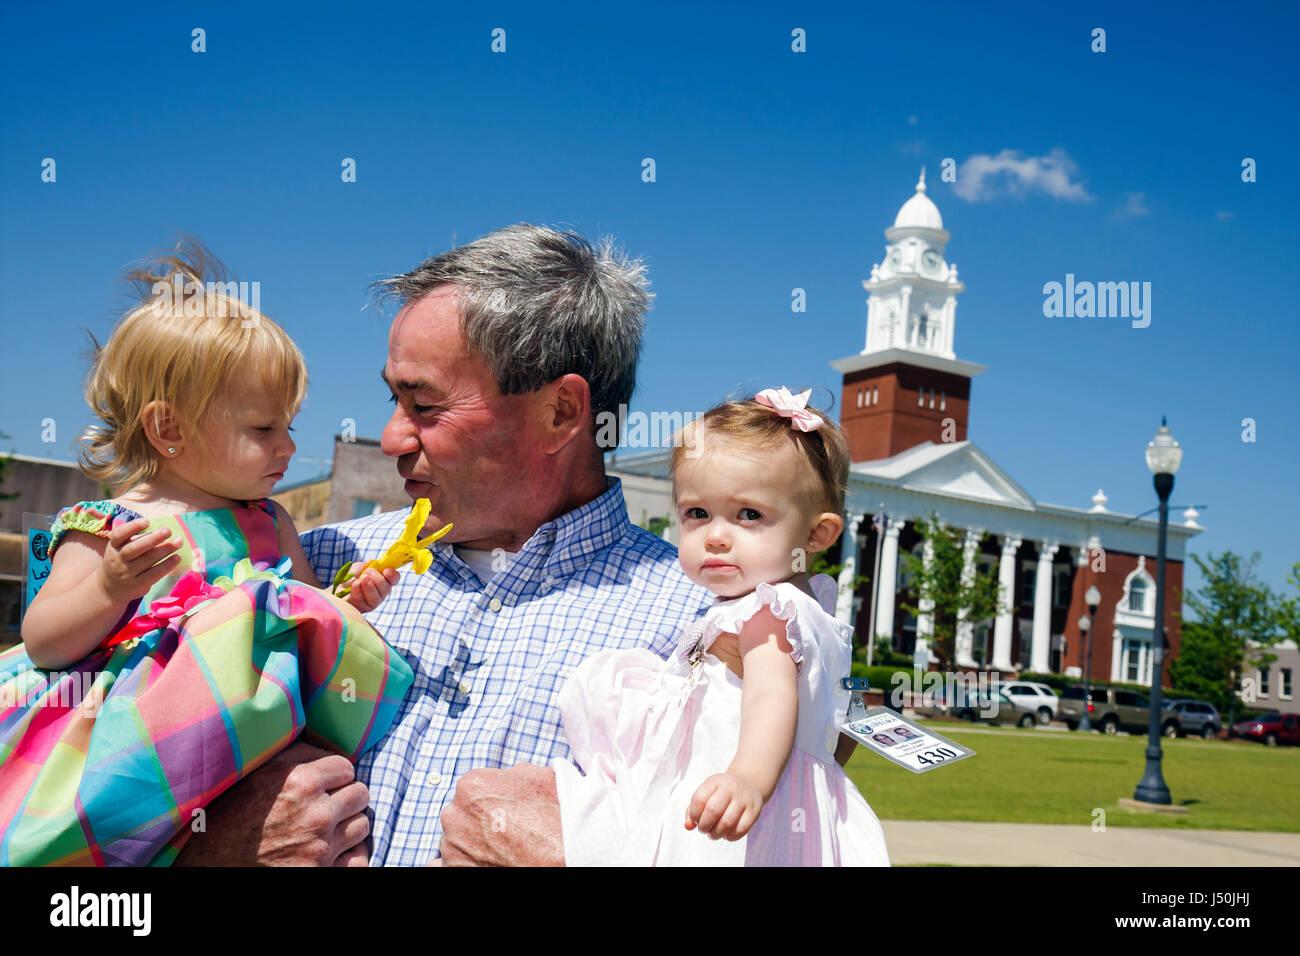 Alabama Opelika Historic District Lee County Courthouse 1896 man baby girl toddler grandfather Corinthian column - Stock Image